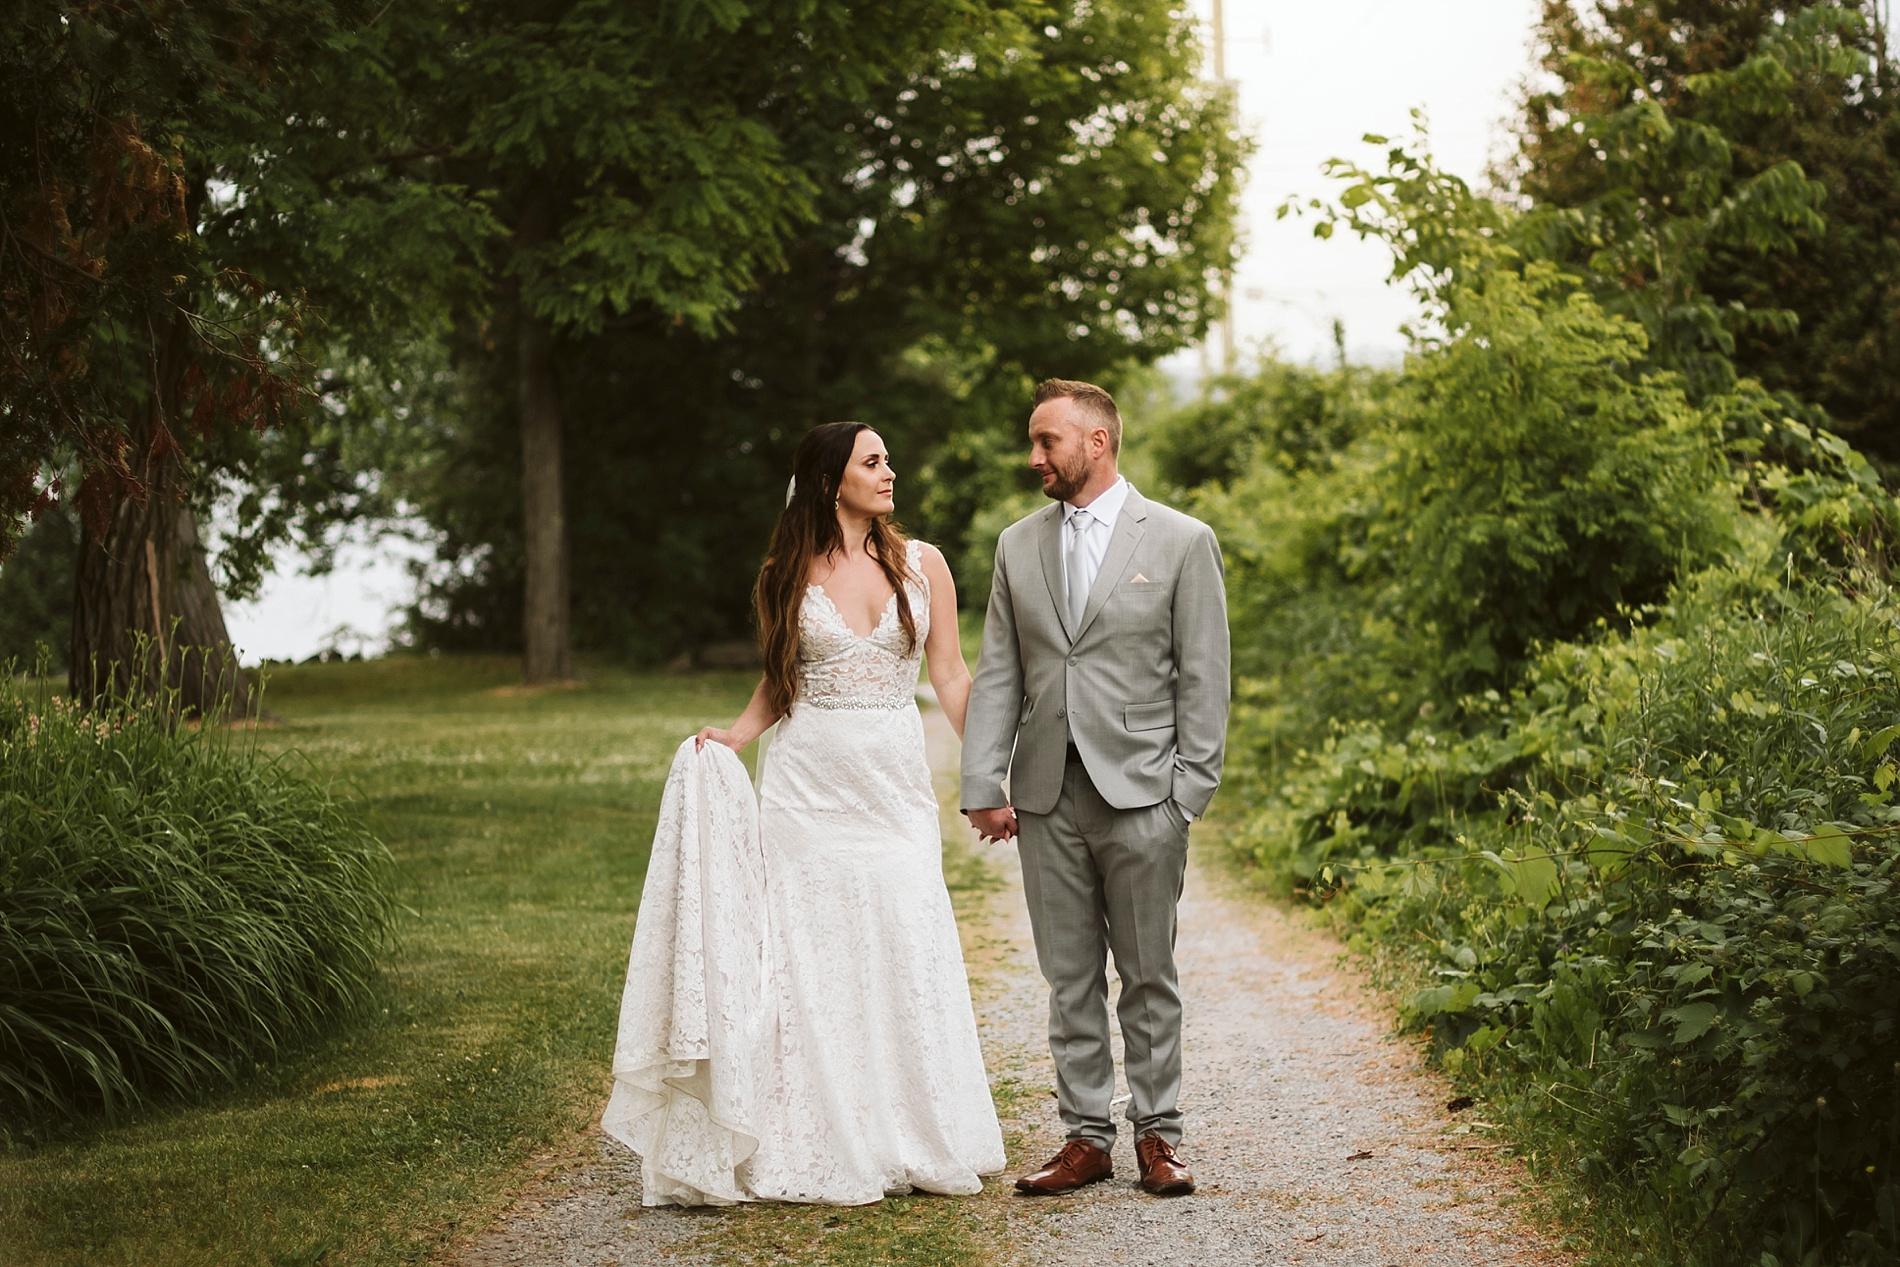 Kawartha_Lakes_Wedding_Bobcageon_Eganridge_Resort_Toronto_Photographer_0056.jpg